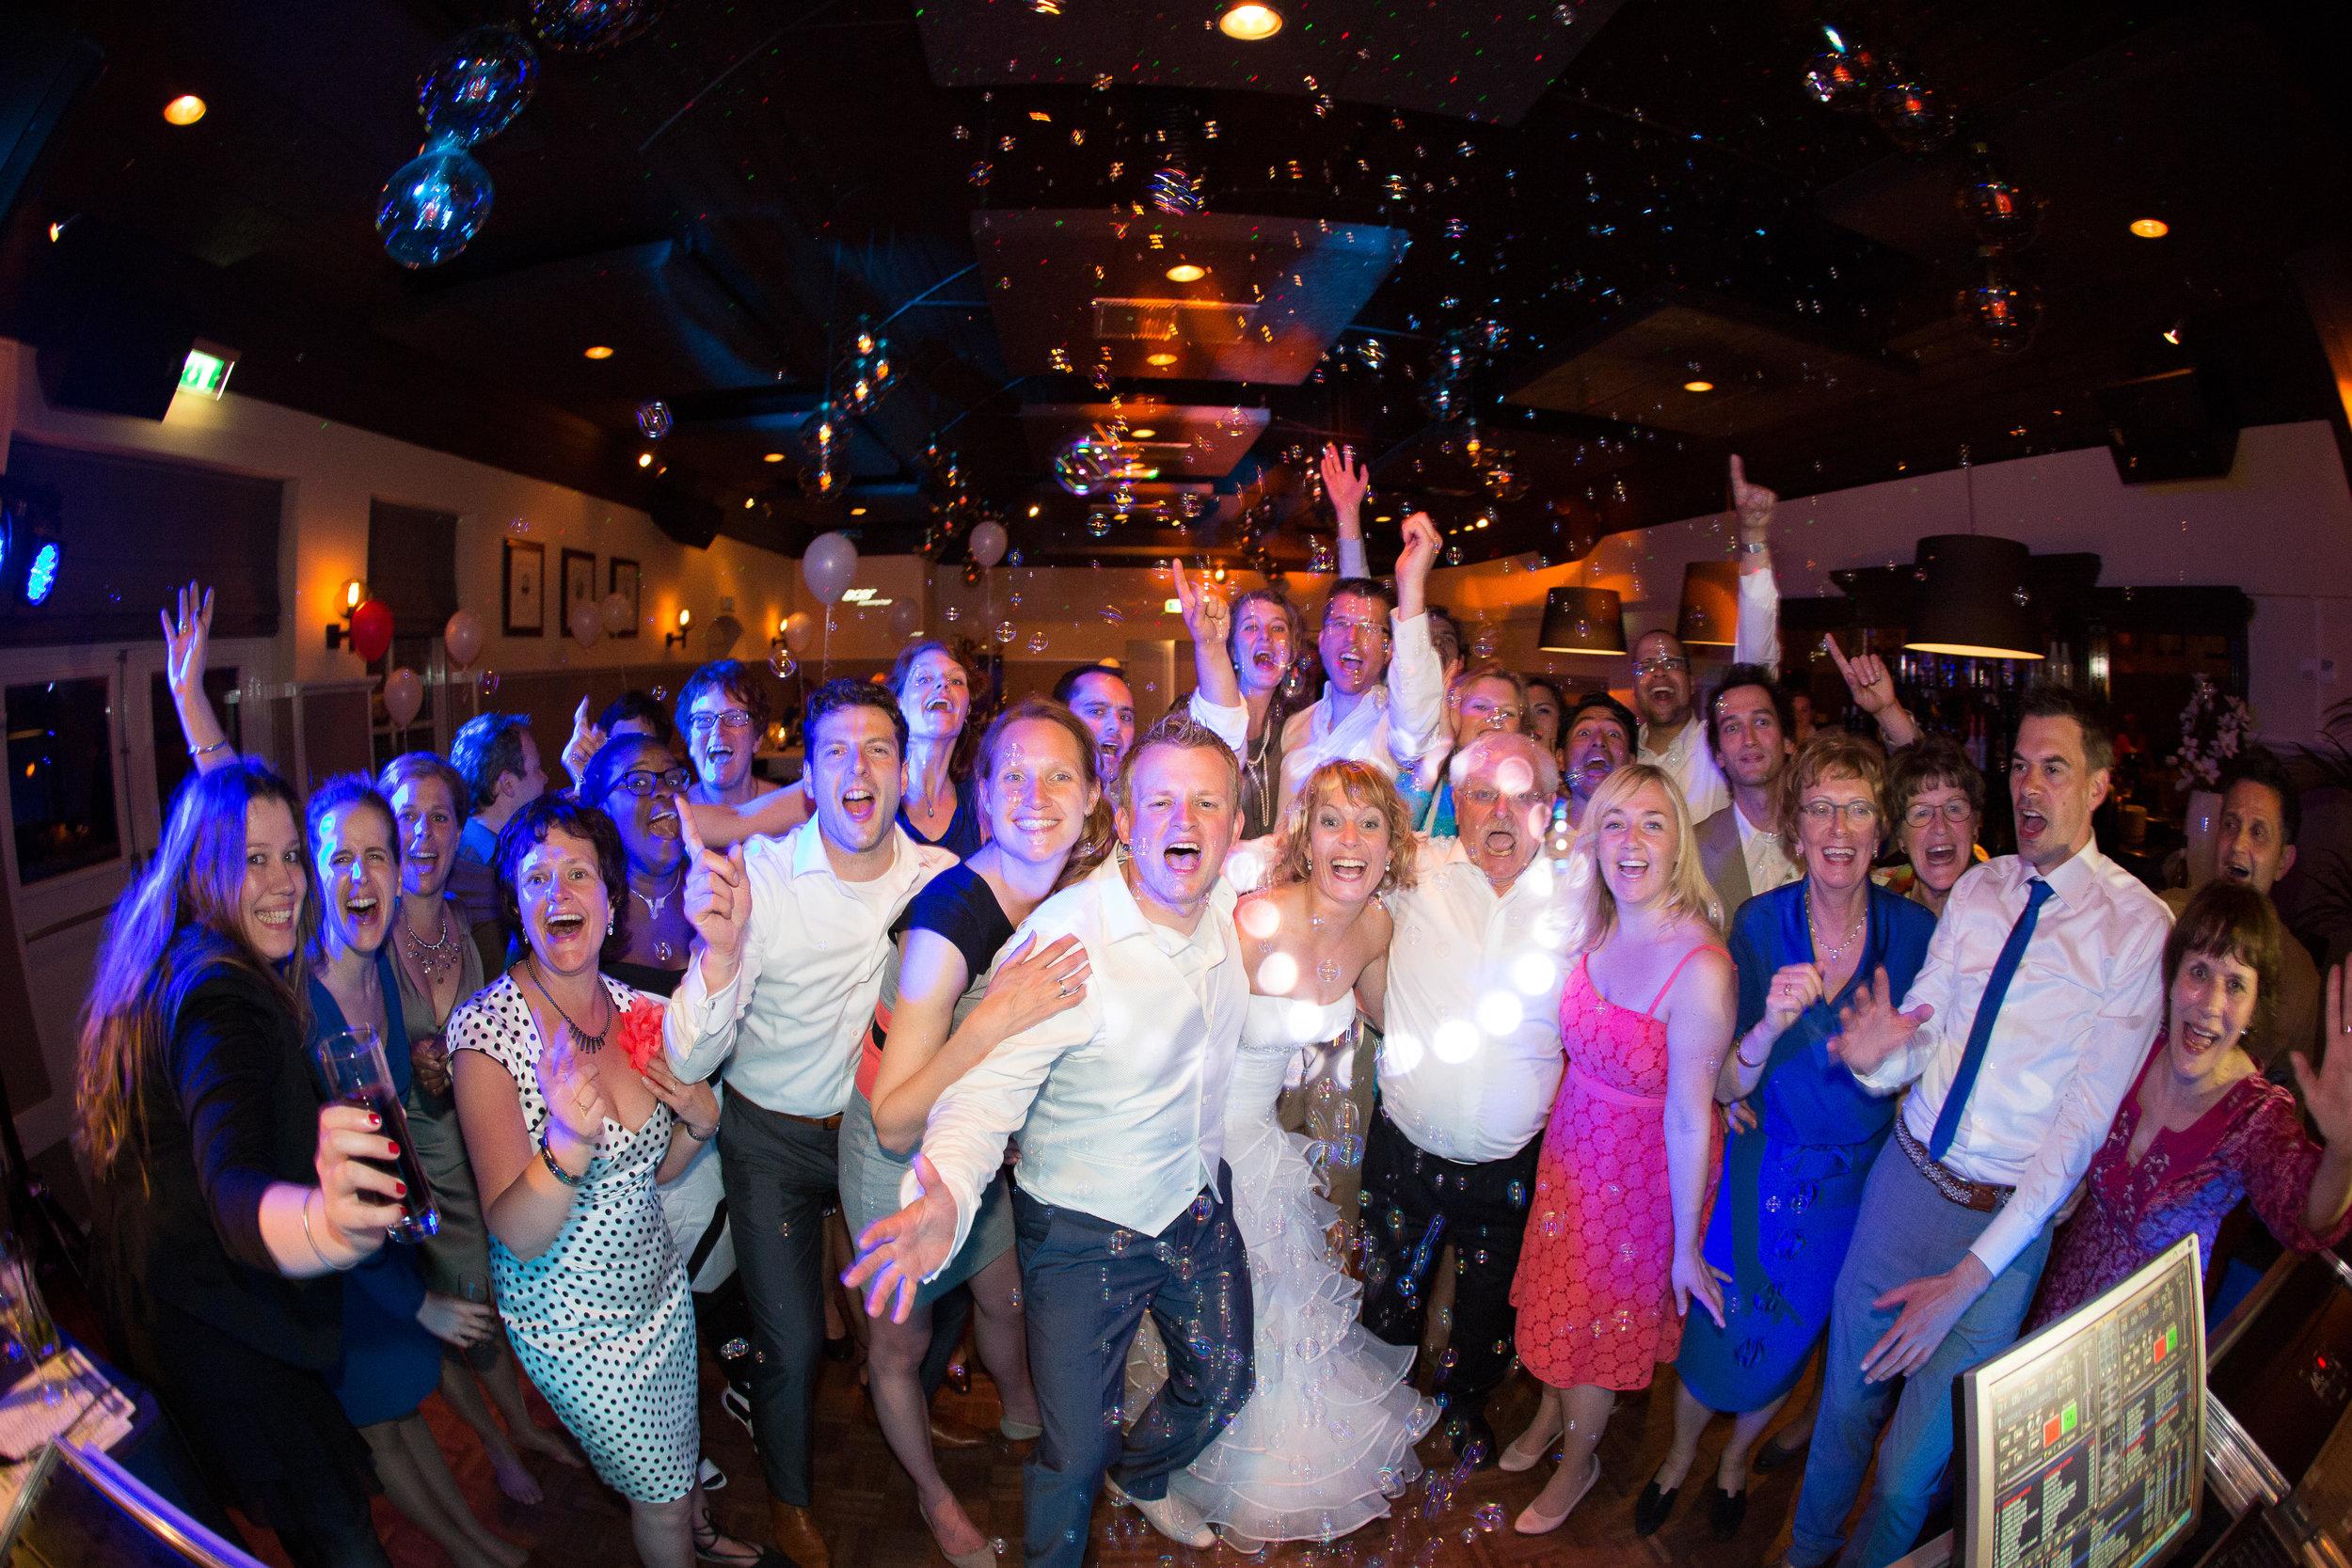 trouwshoot-bruidsfotografie-trouwfoto-feestfotografie-marcel en desiree-302.jpg